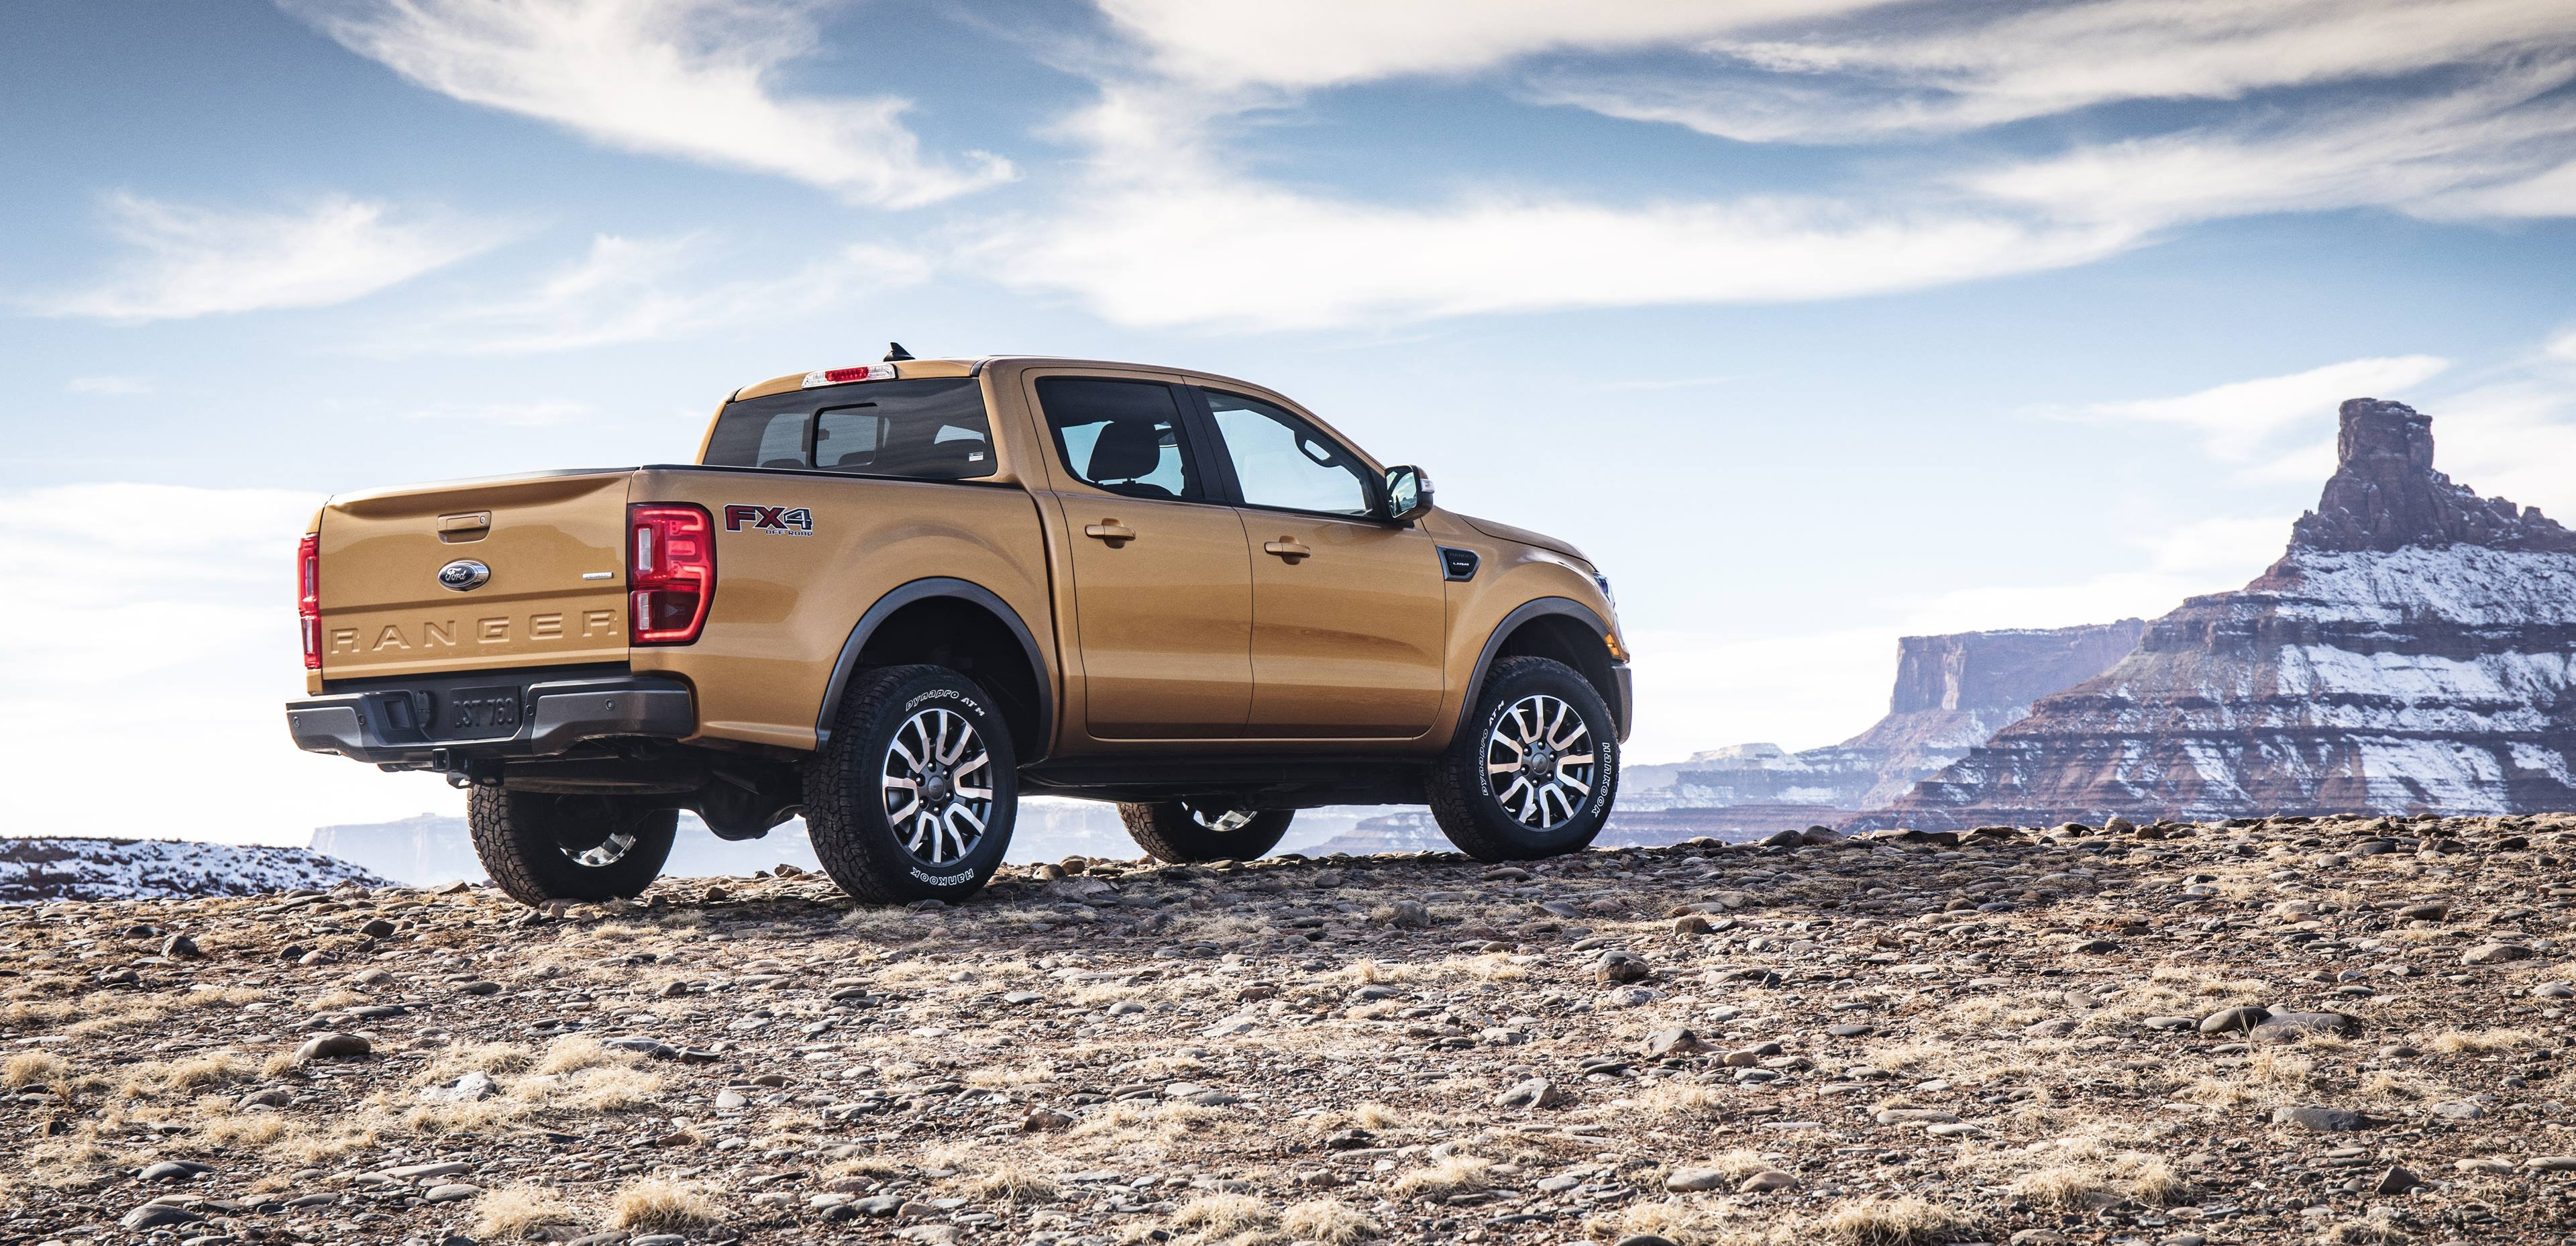 2019 Ford Ranger rear 3/4